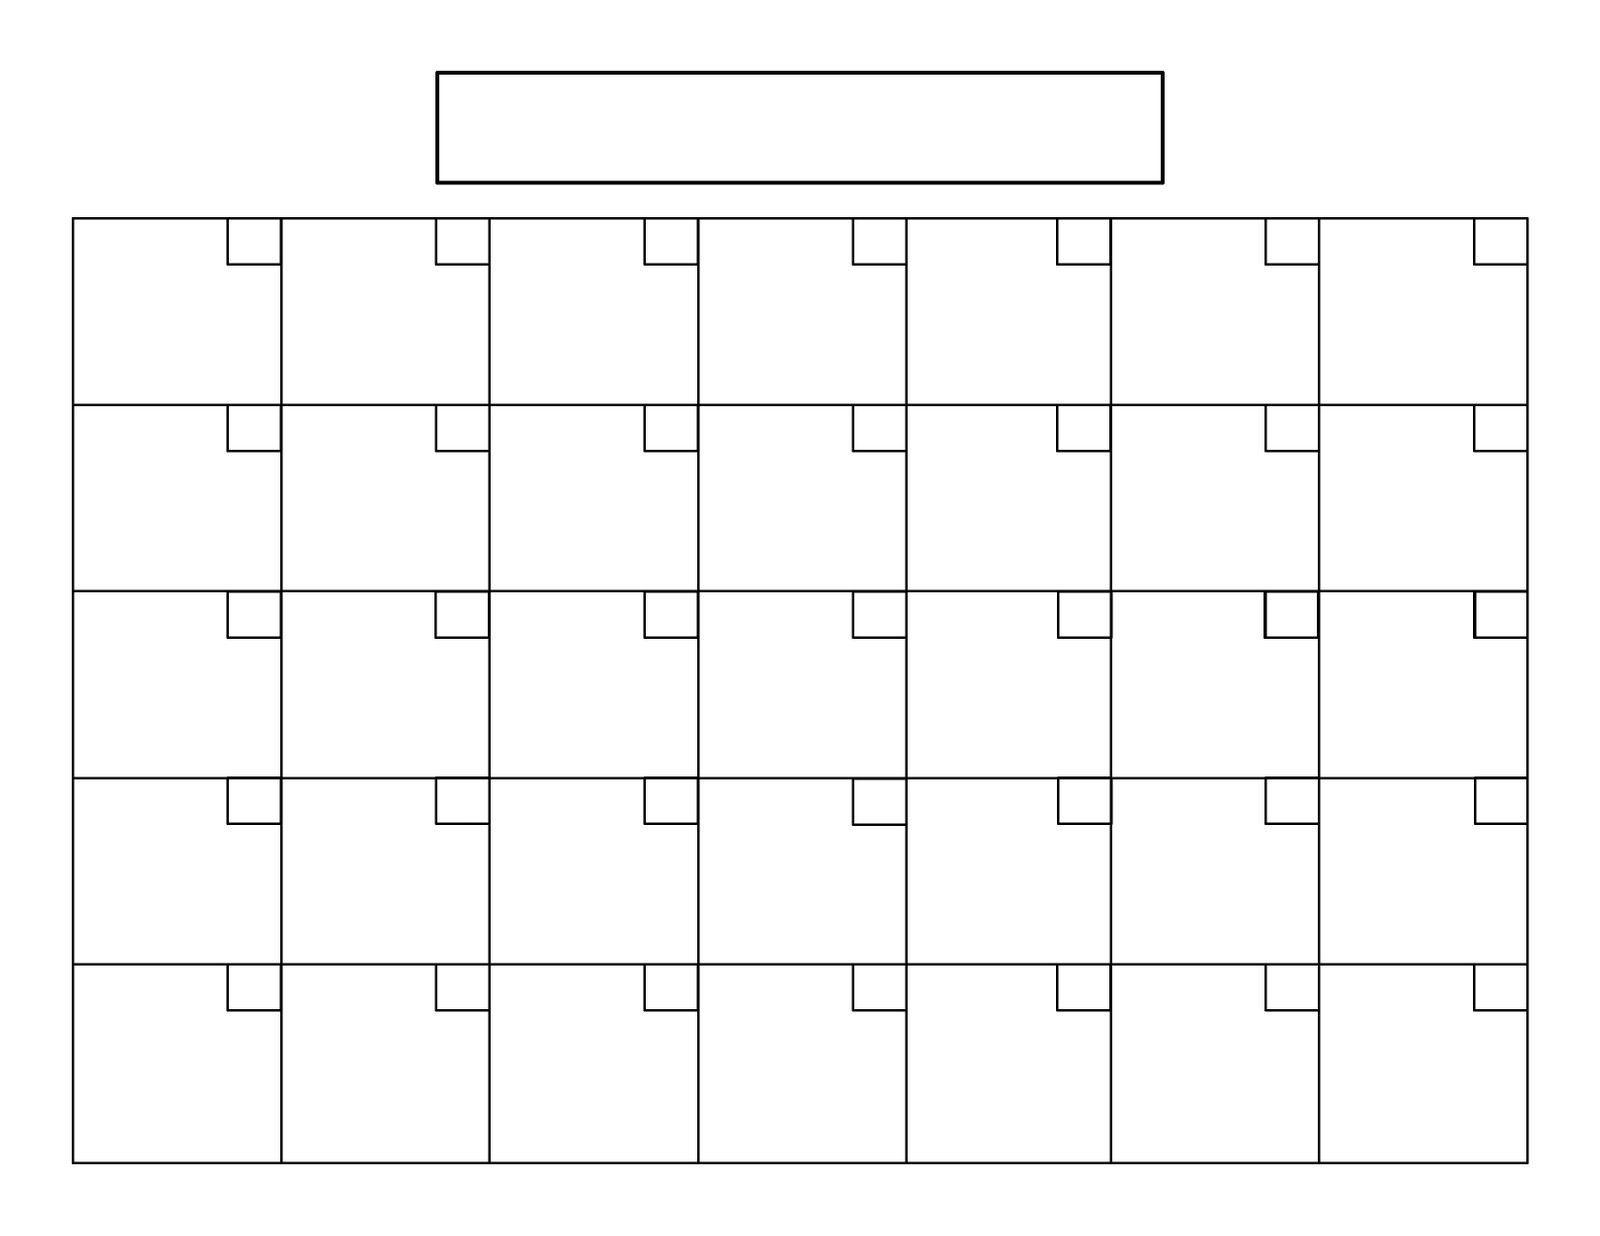 Perpetual Calendar Tutorial (With Images) | Blank Calendar